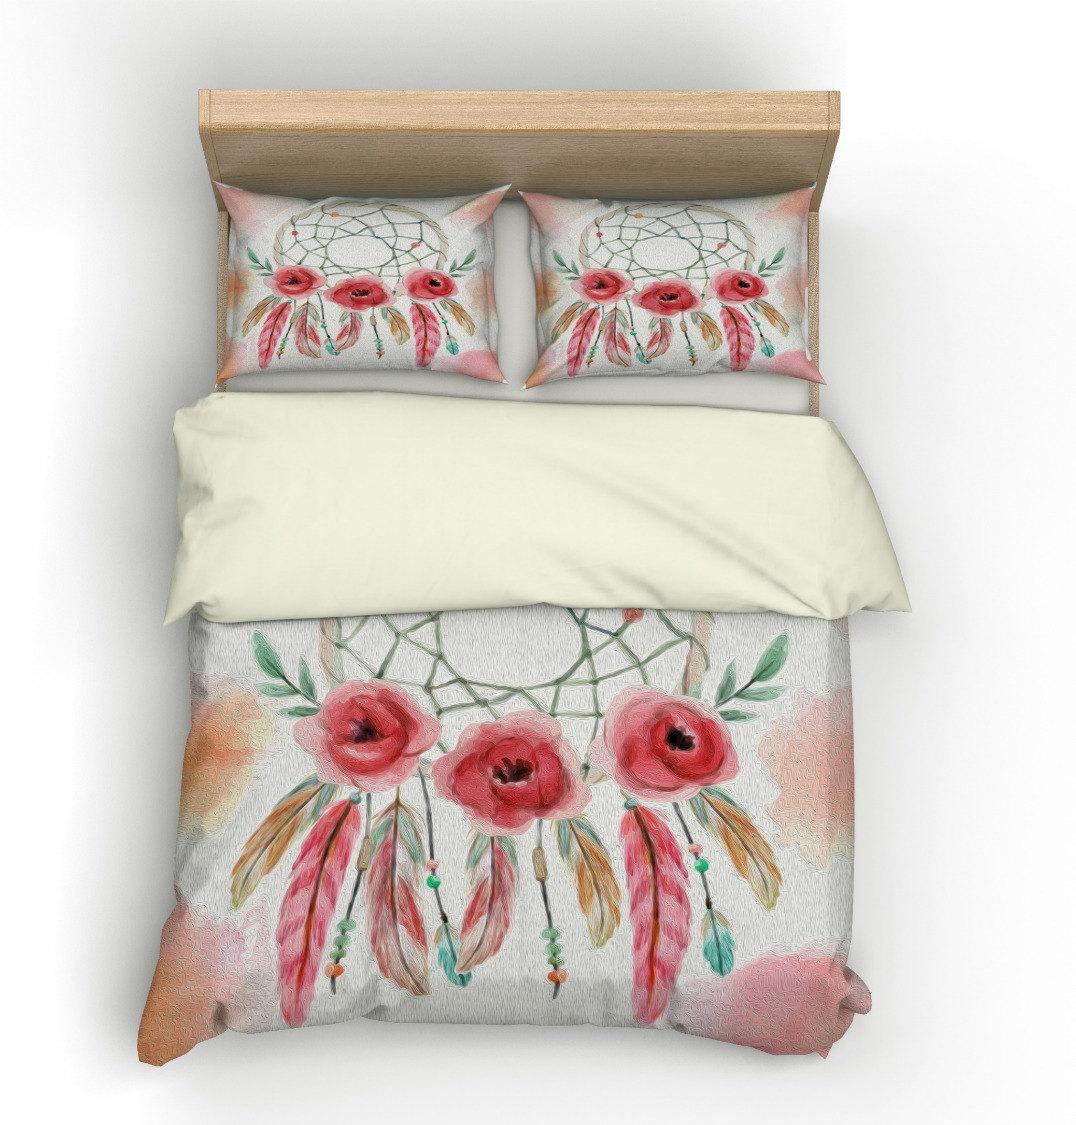 boho chic duvet cover dream catcher twin full queen king. Black Bedroom Furniture Sets. Home Design Ideas